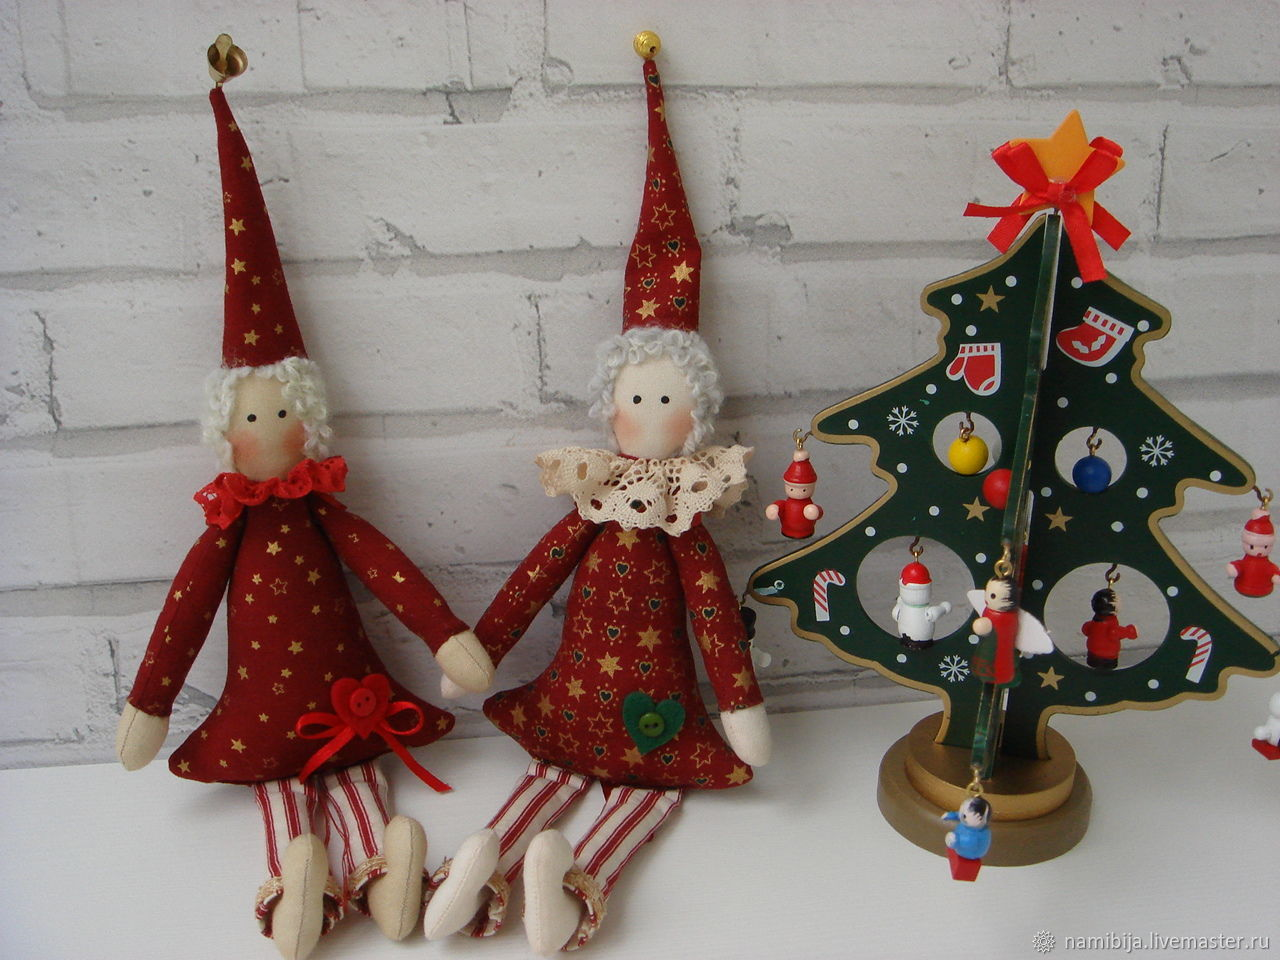 Новогодние Гномики, Куклы Тильда, Санкт-Петербург,  Фото №1